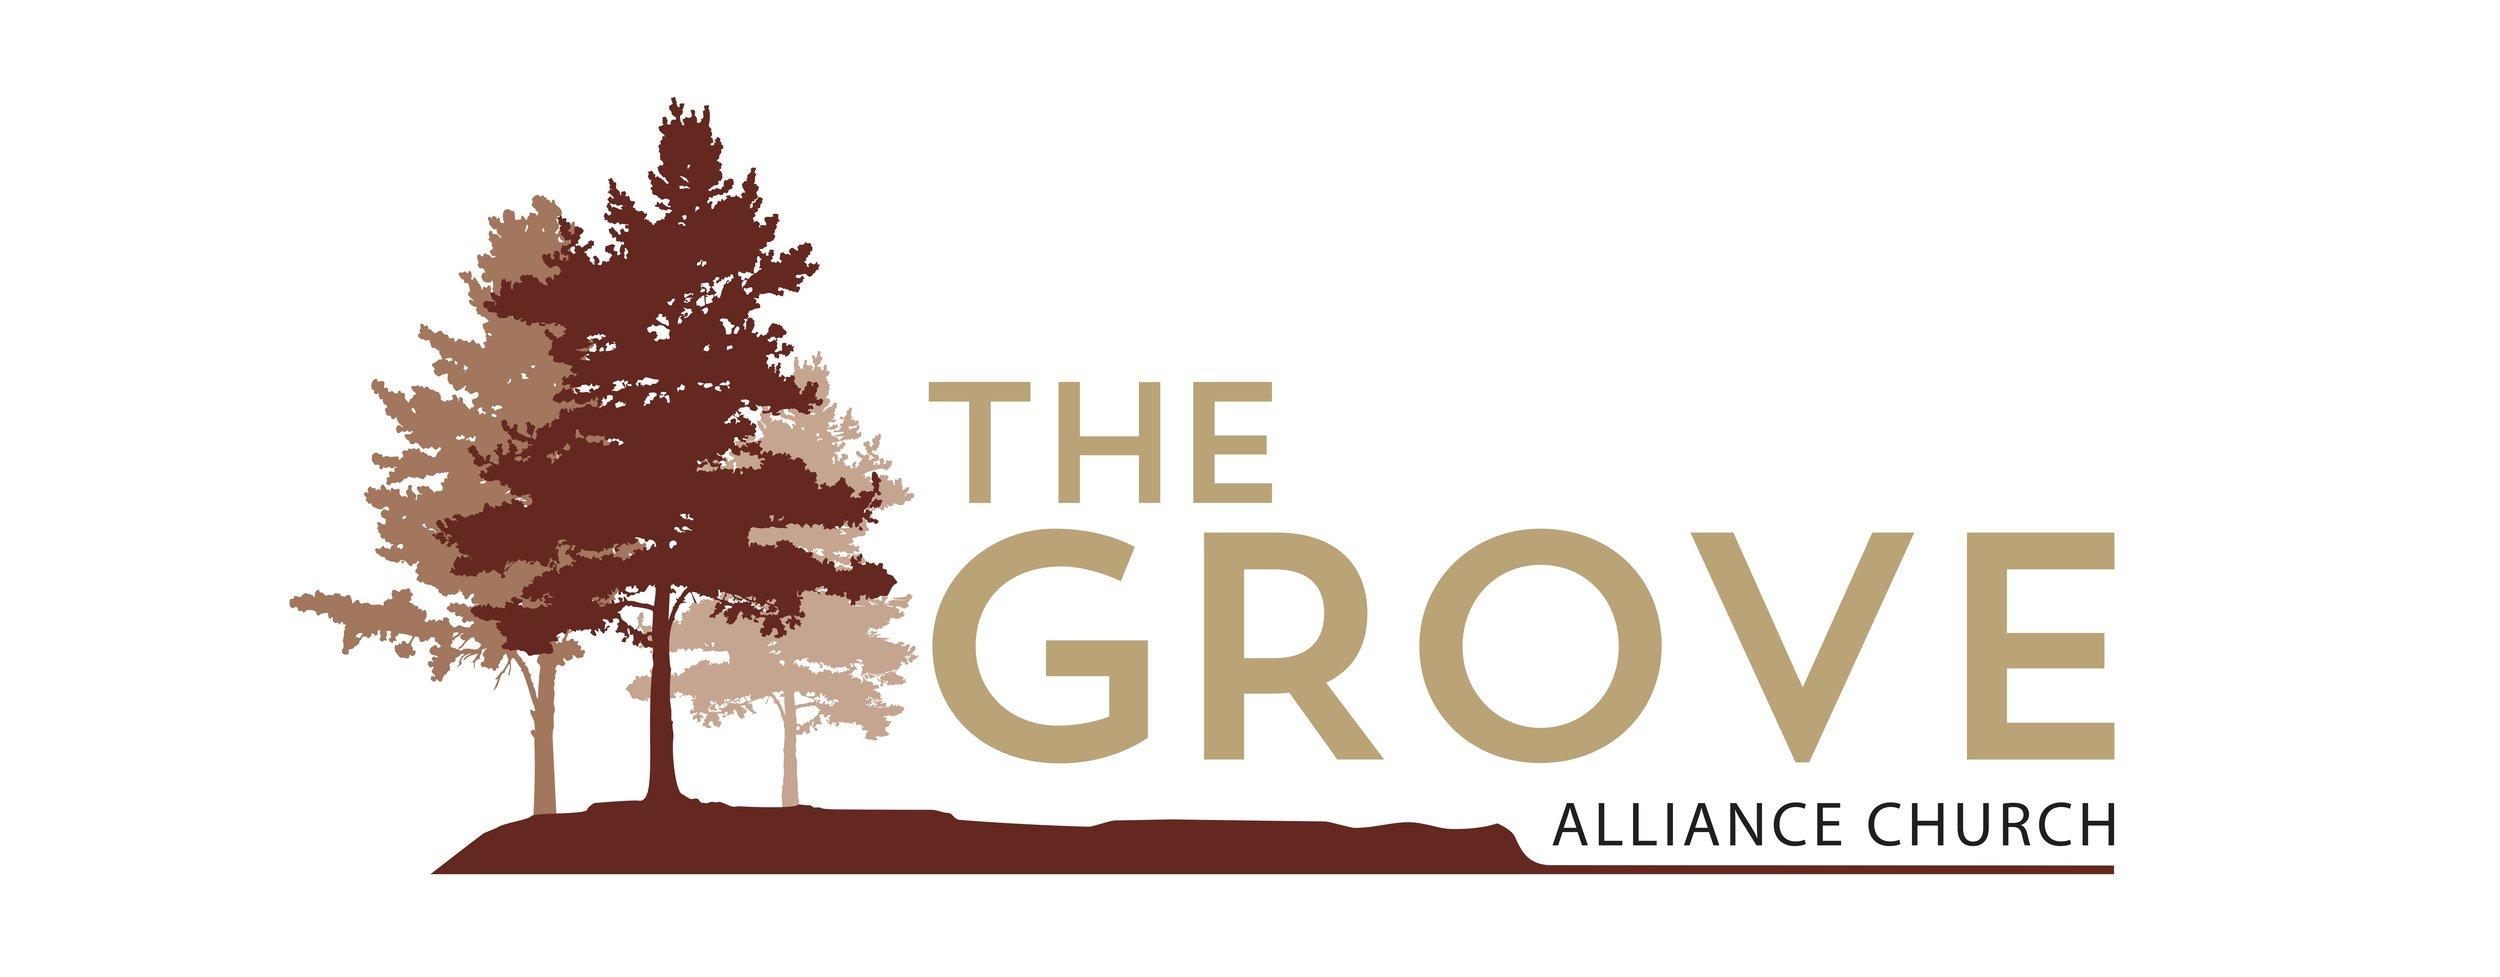 The_Grove - Version 2.jpg